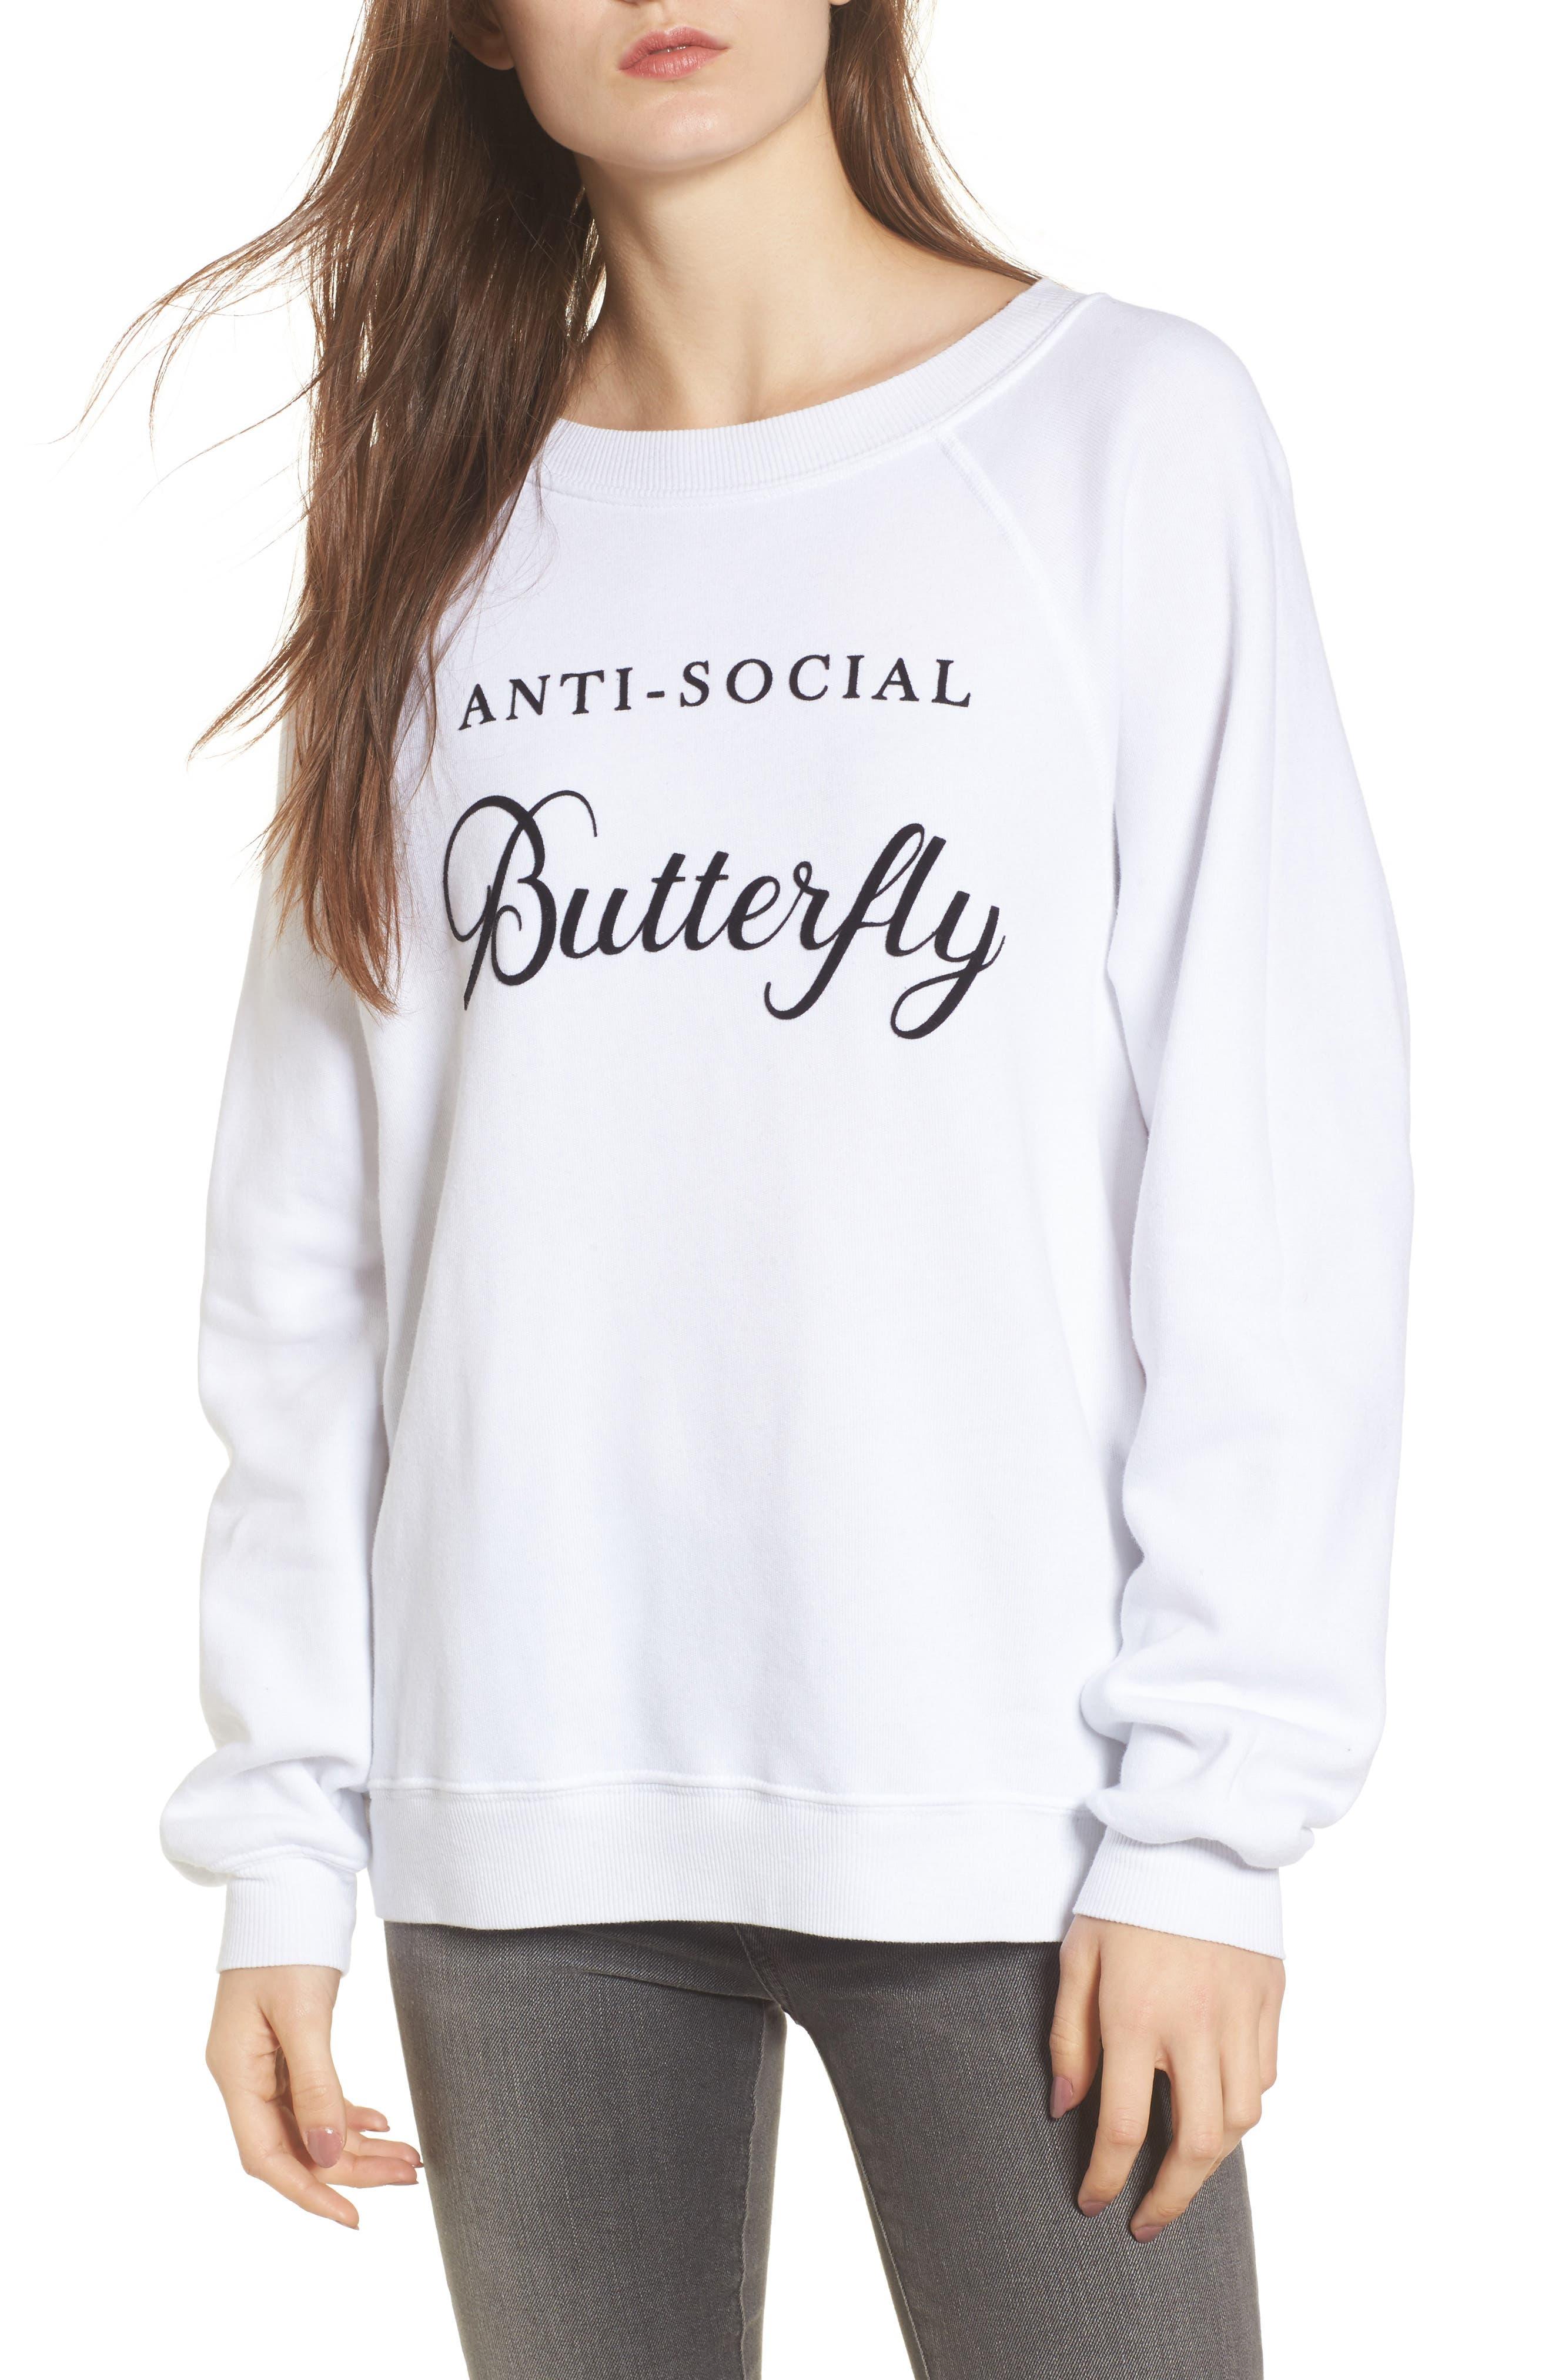 Alternate Image 1 Selected - Wildfox Anti-Social Butterfly Sweatshirt